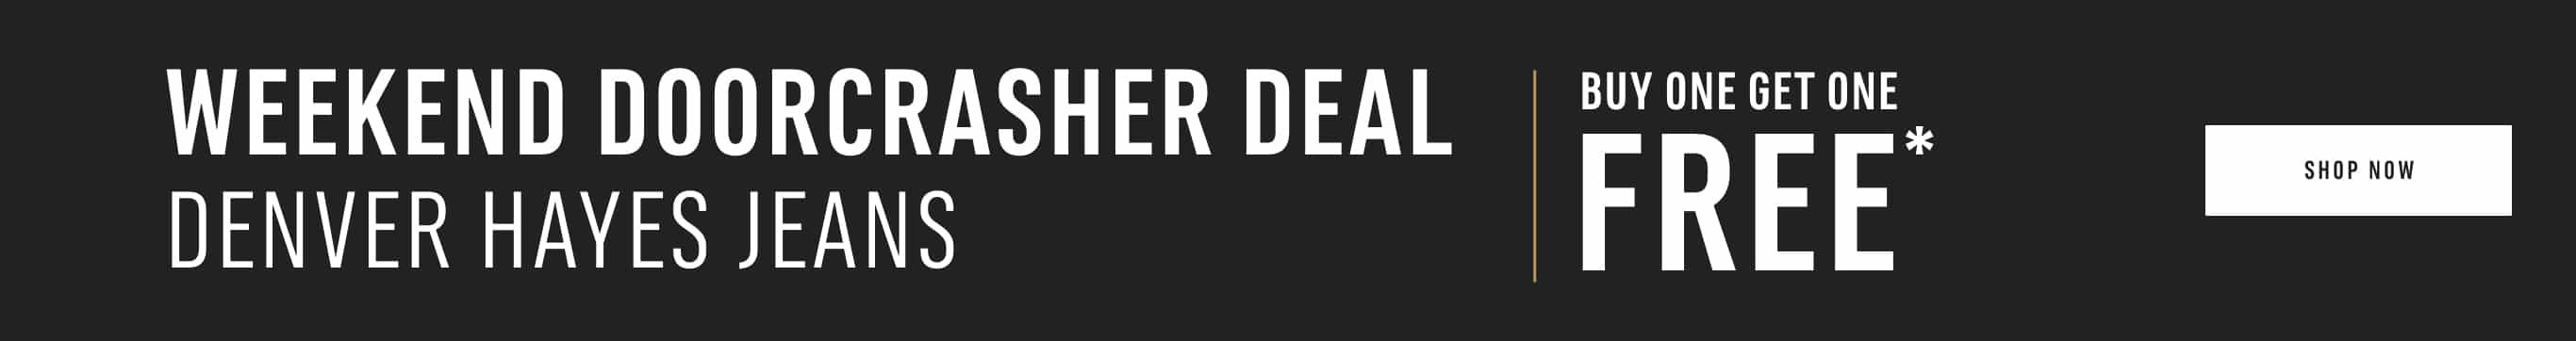 Weekend Doorcrasher Deal. Denver Hayes Jeans Buy One Get One Free*. Shop Now.